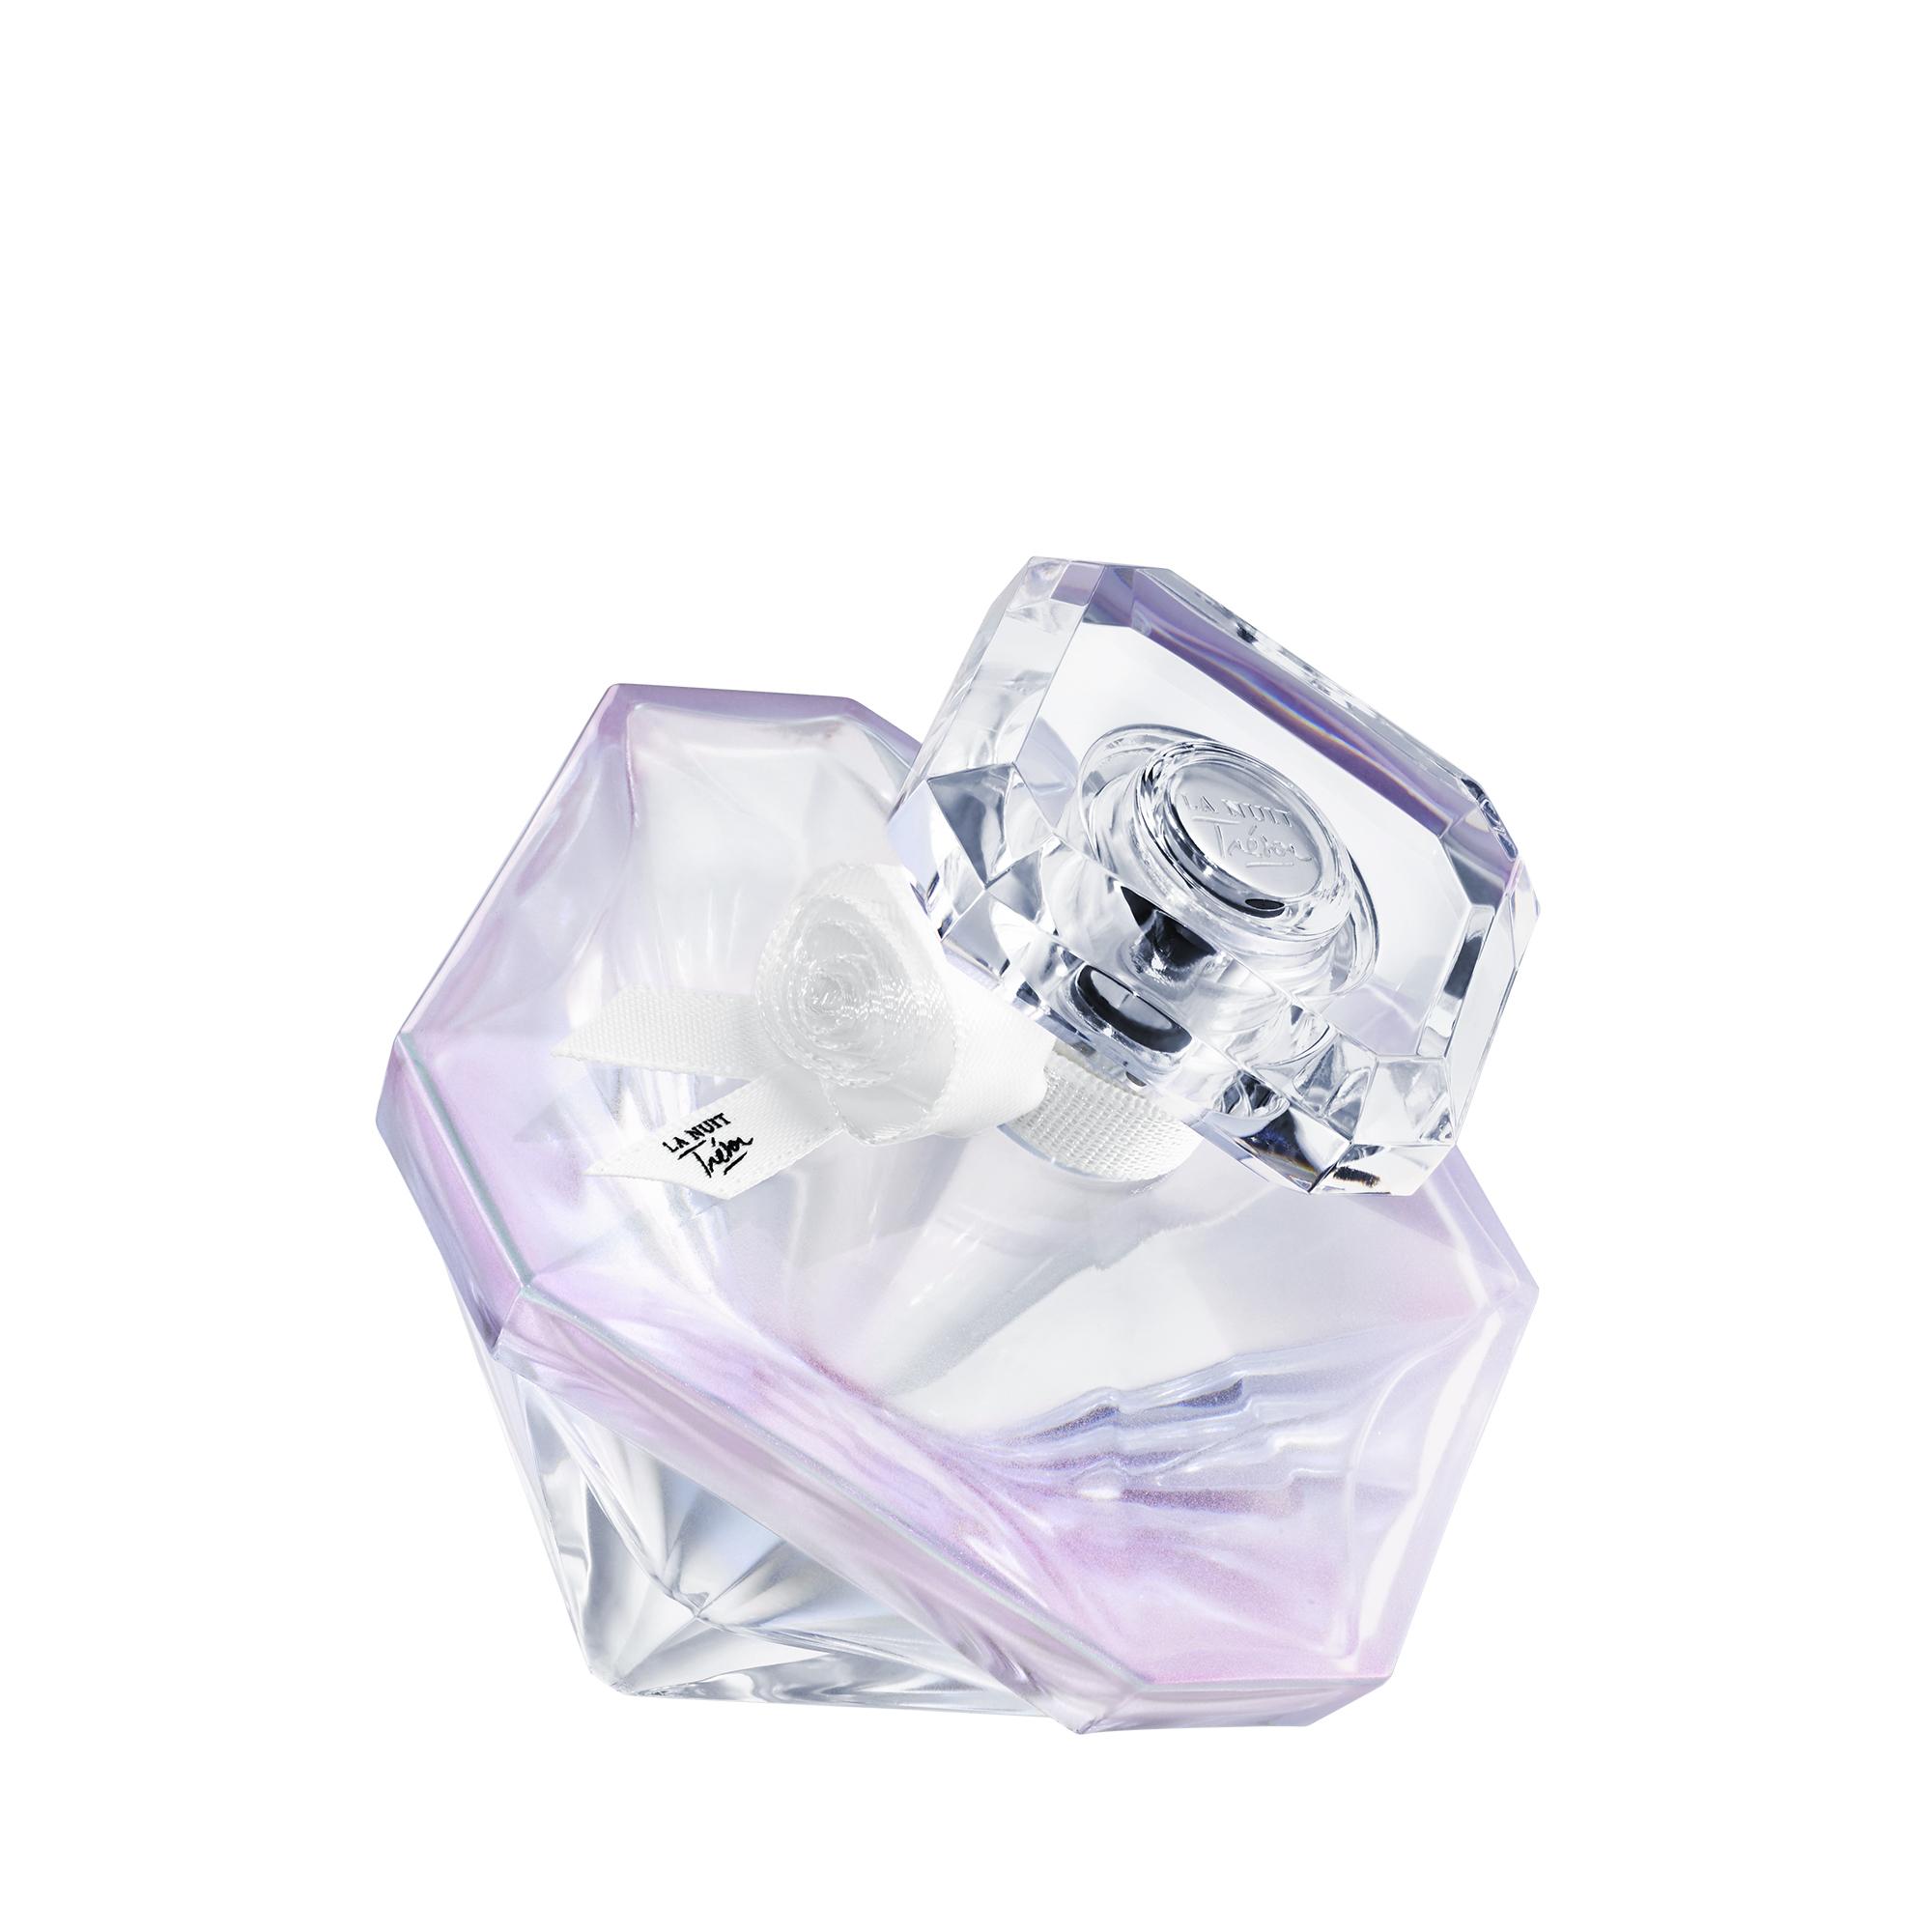 La Nuit Tresor Musc Diamant Edp 50ml